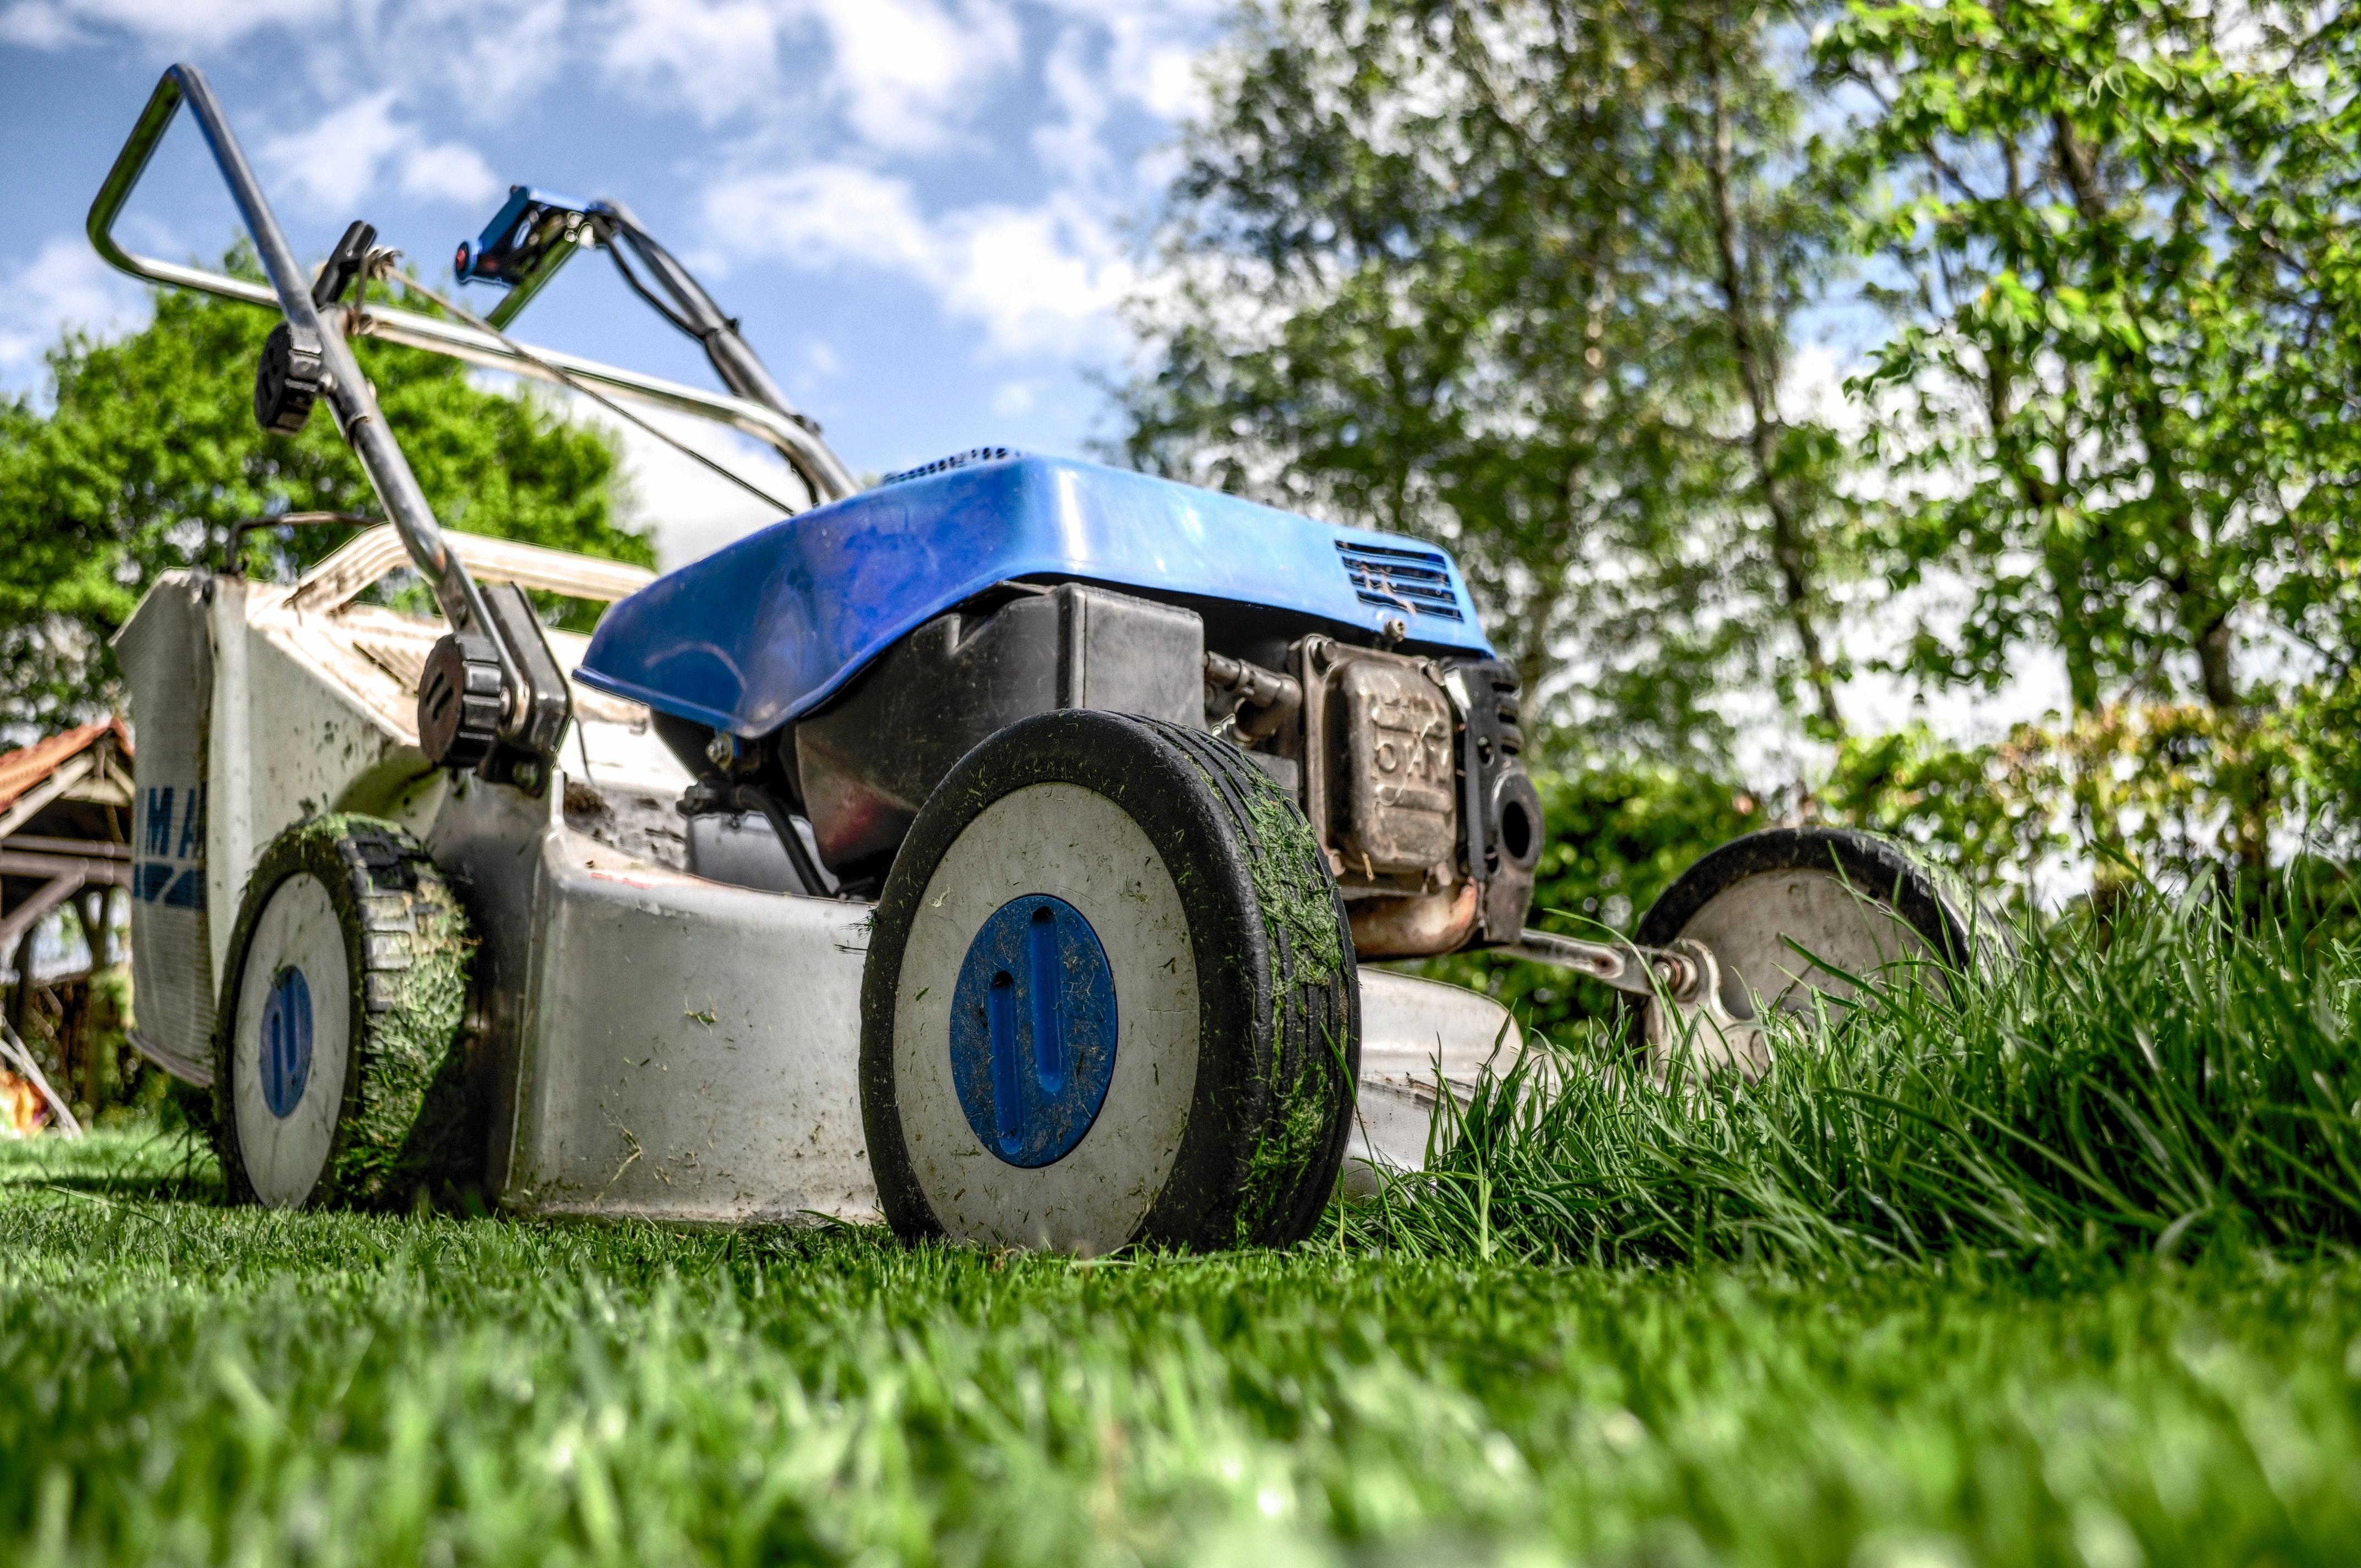 garden-gardening-grass-589